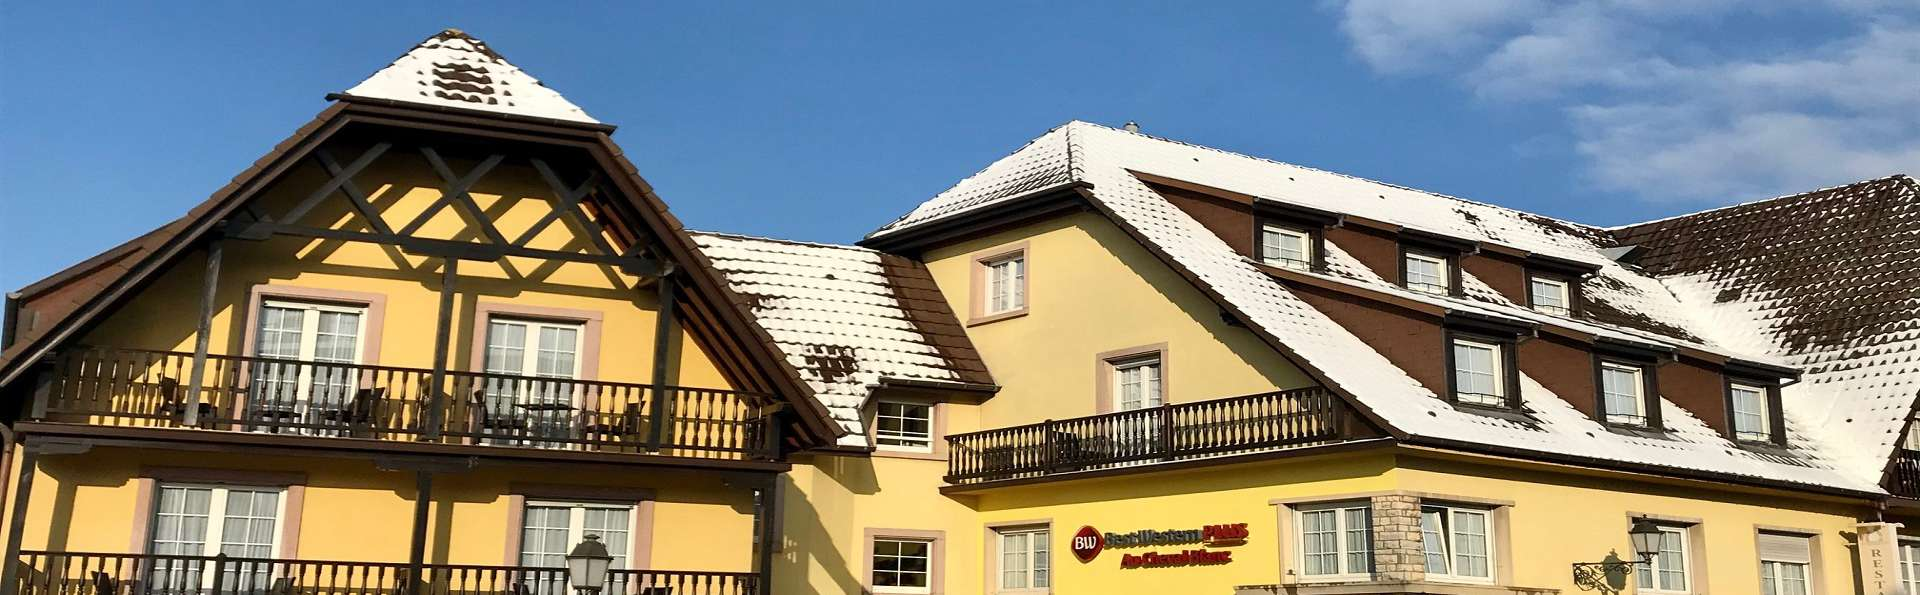 Best Western Plus Au Cheval Blanc Mulhouse Nord - facade_hiver_3.jpg